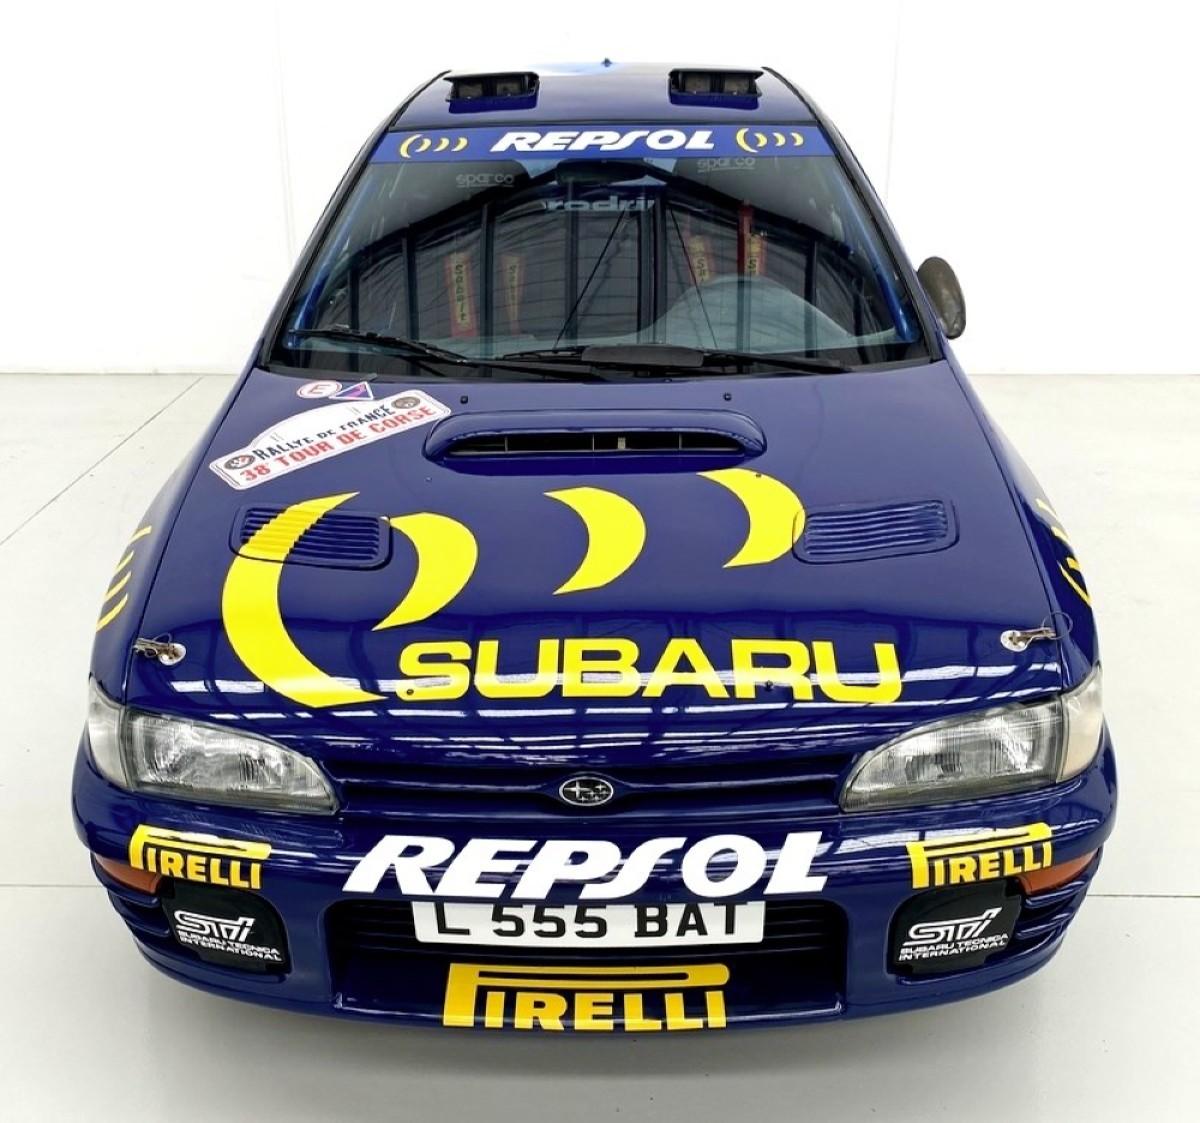 1994 Subaru WRX Prodrive 555 Group A rally car 1